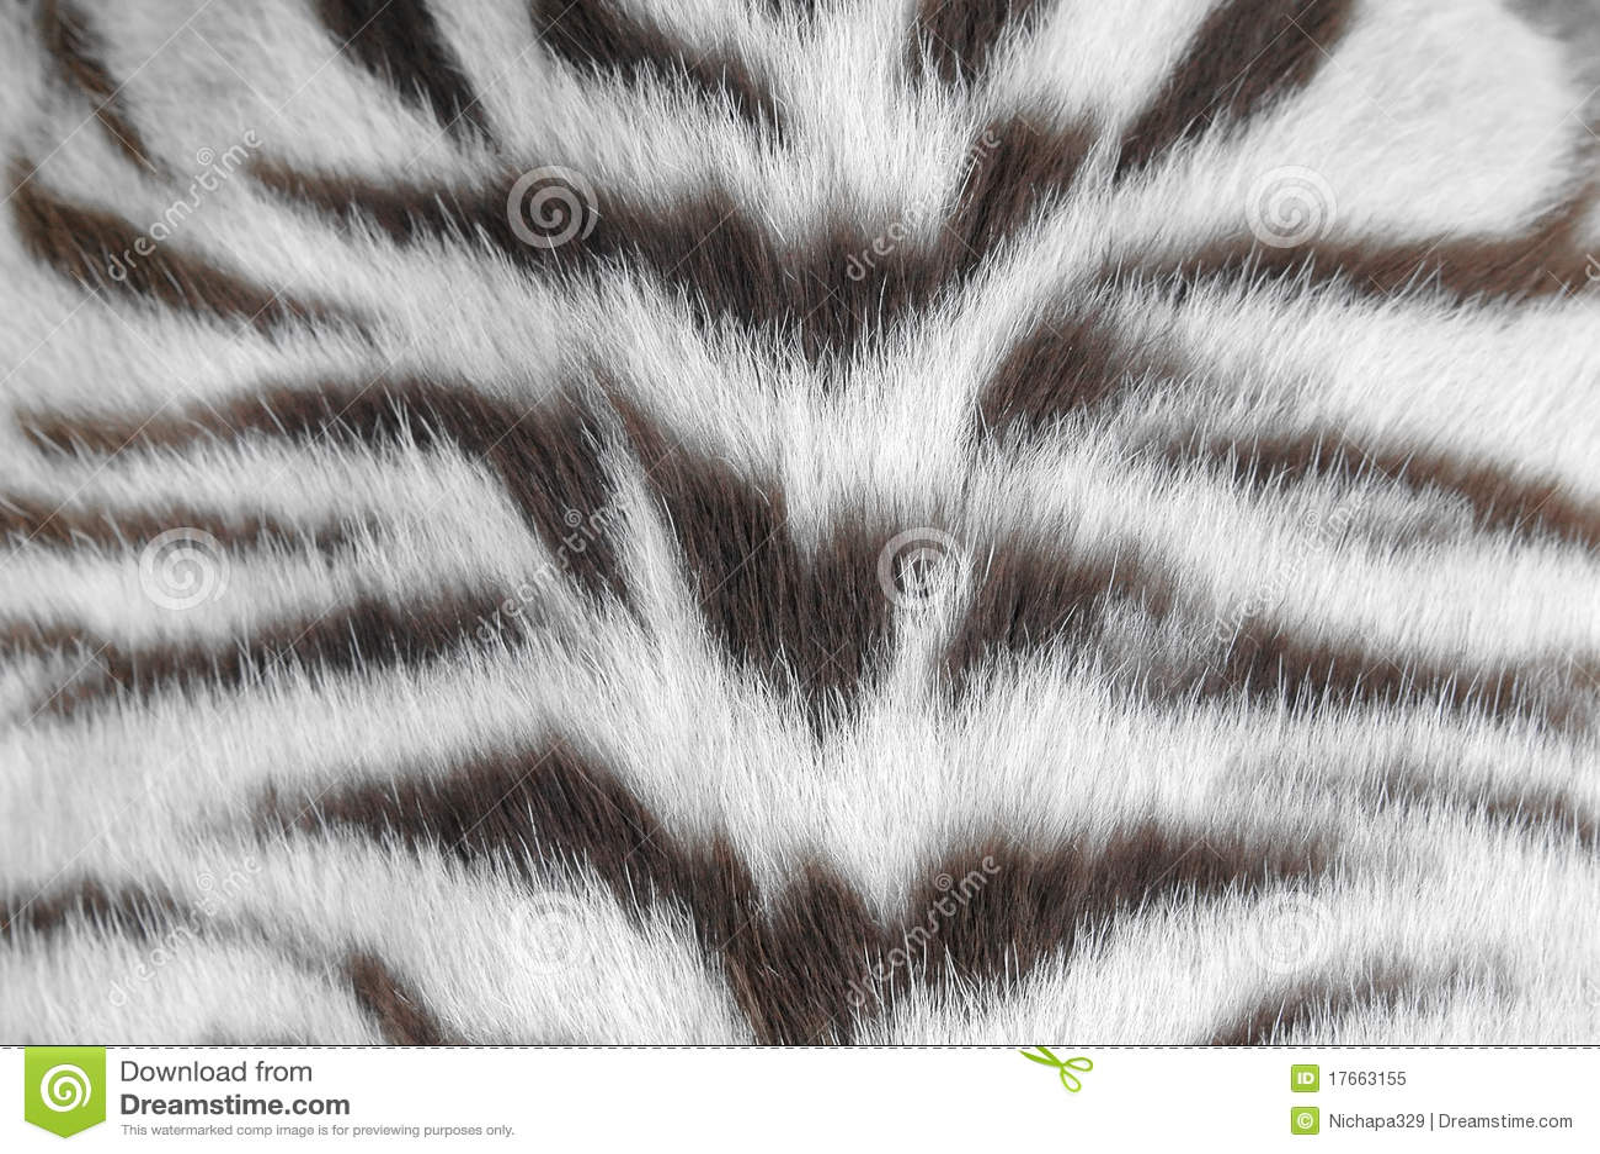 white tiger skin background - photo #24